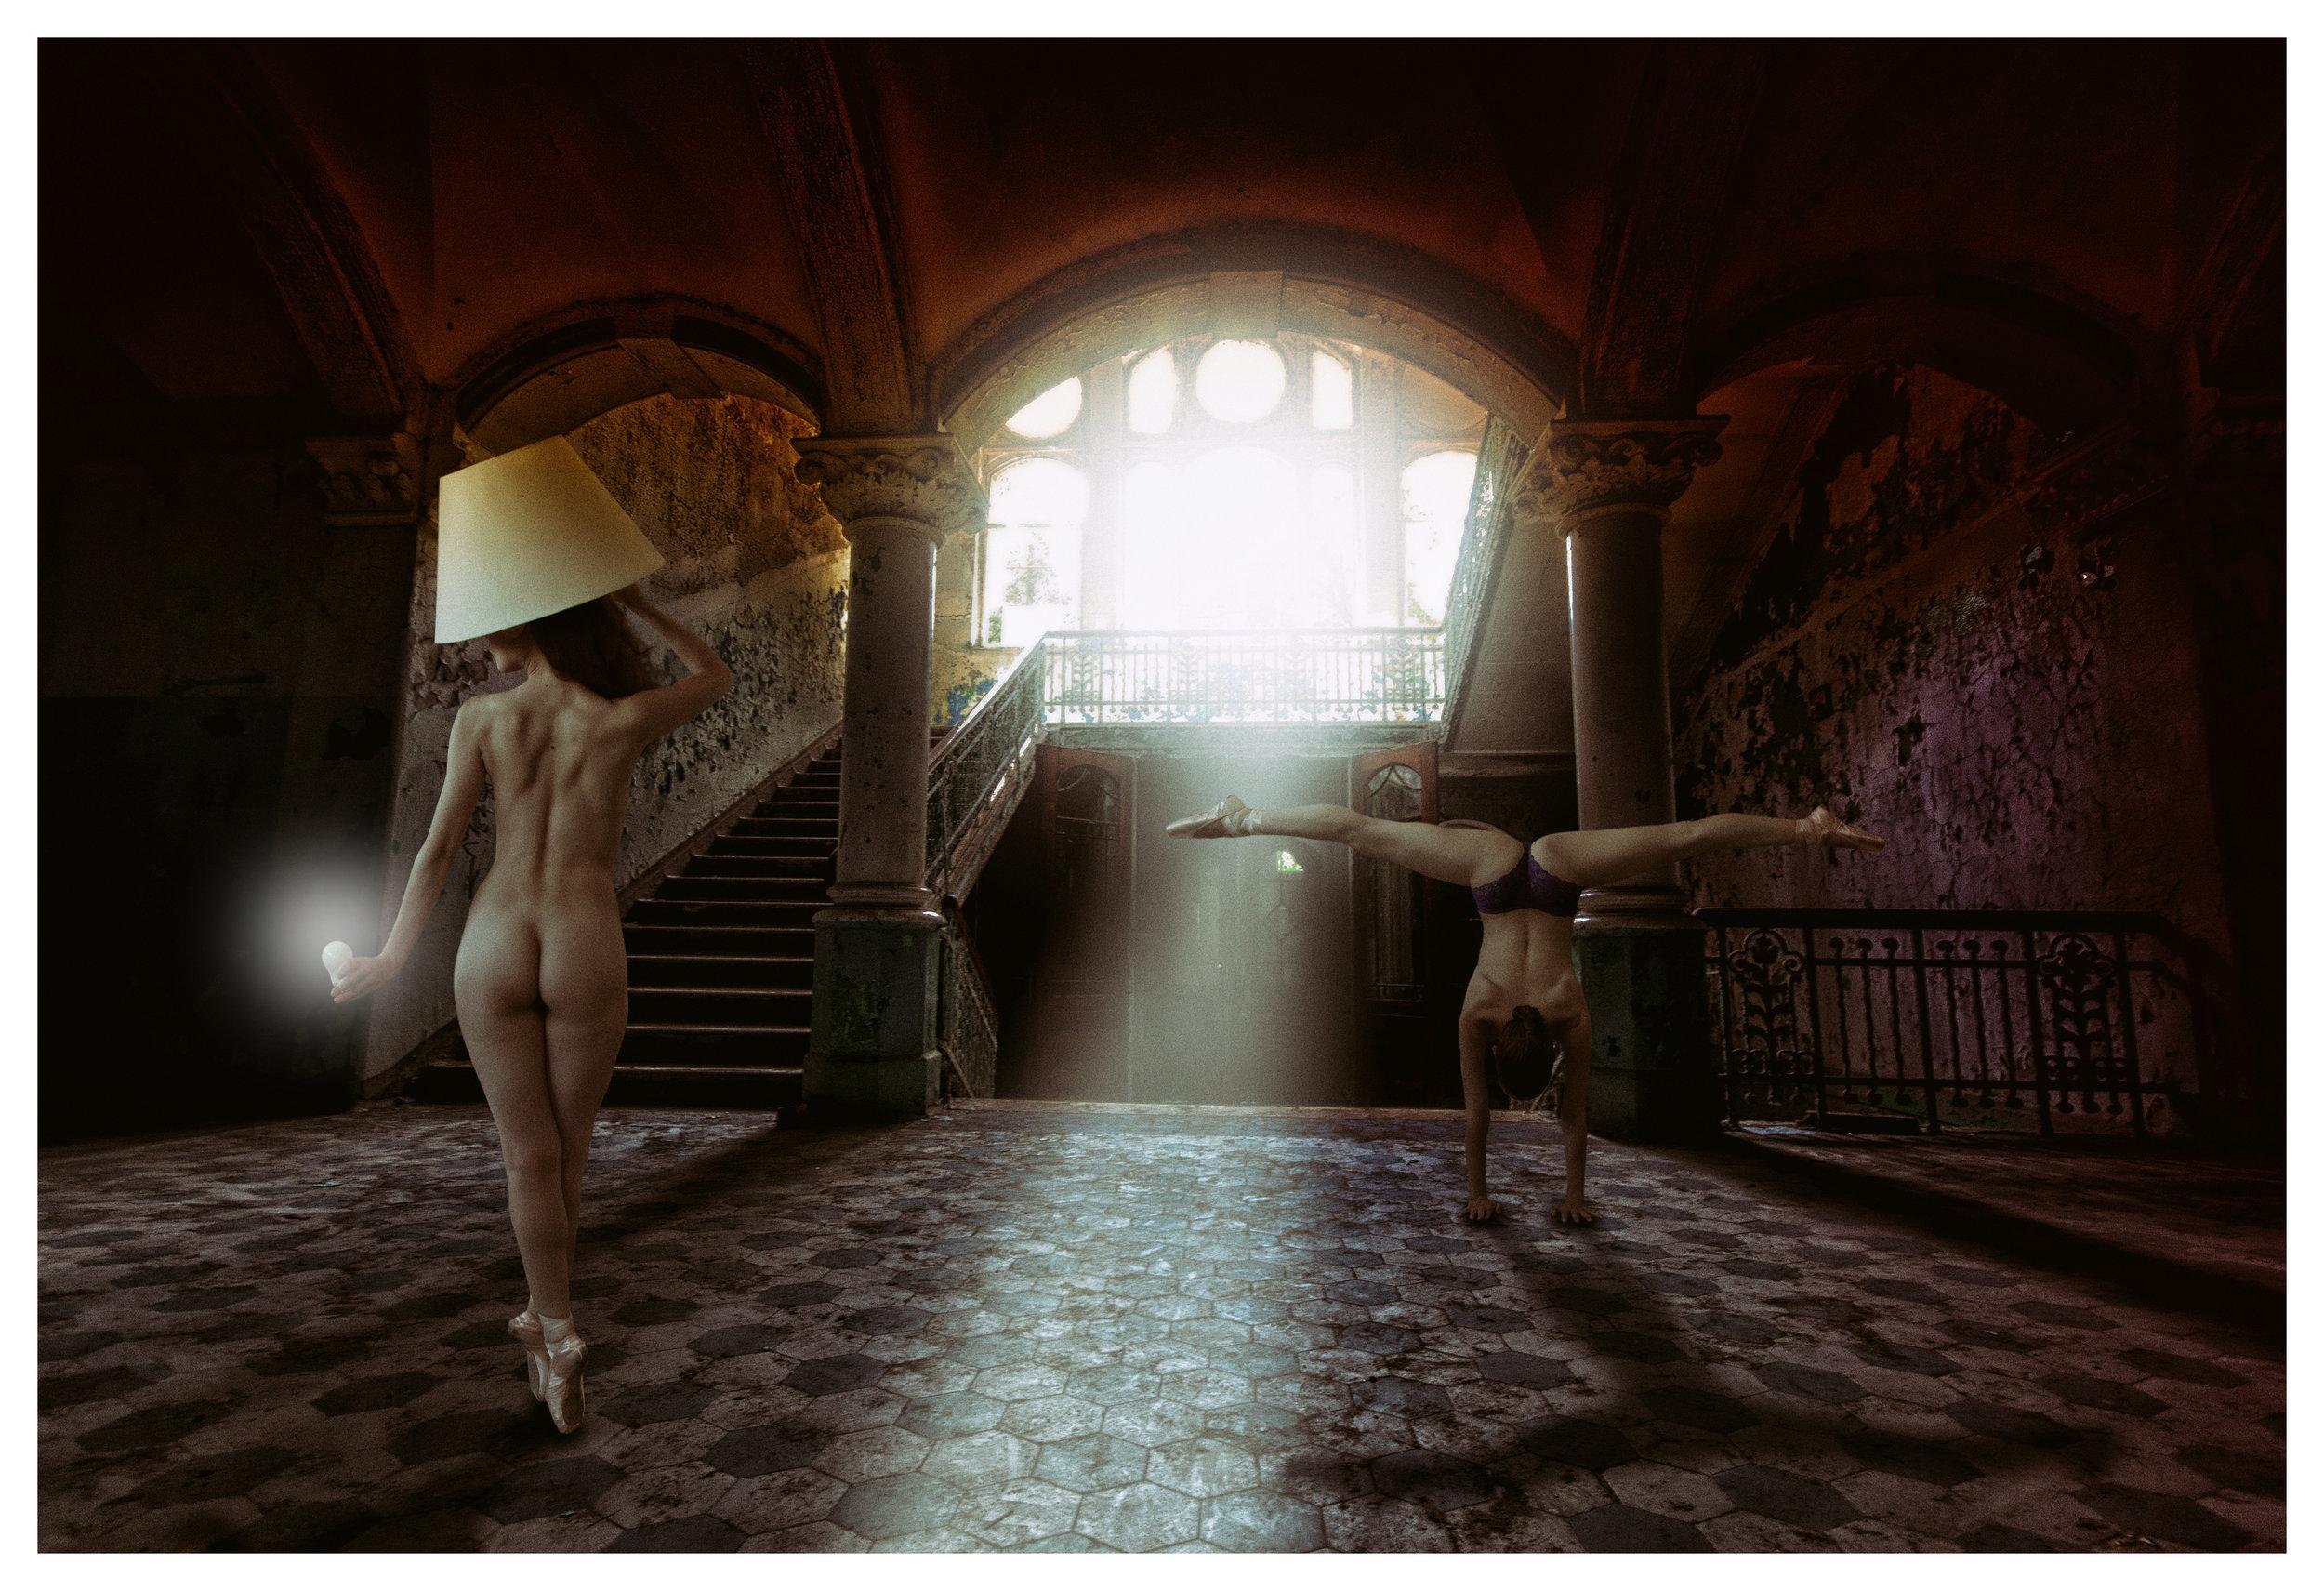 Dancing in the light. (2015)